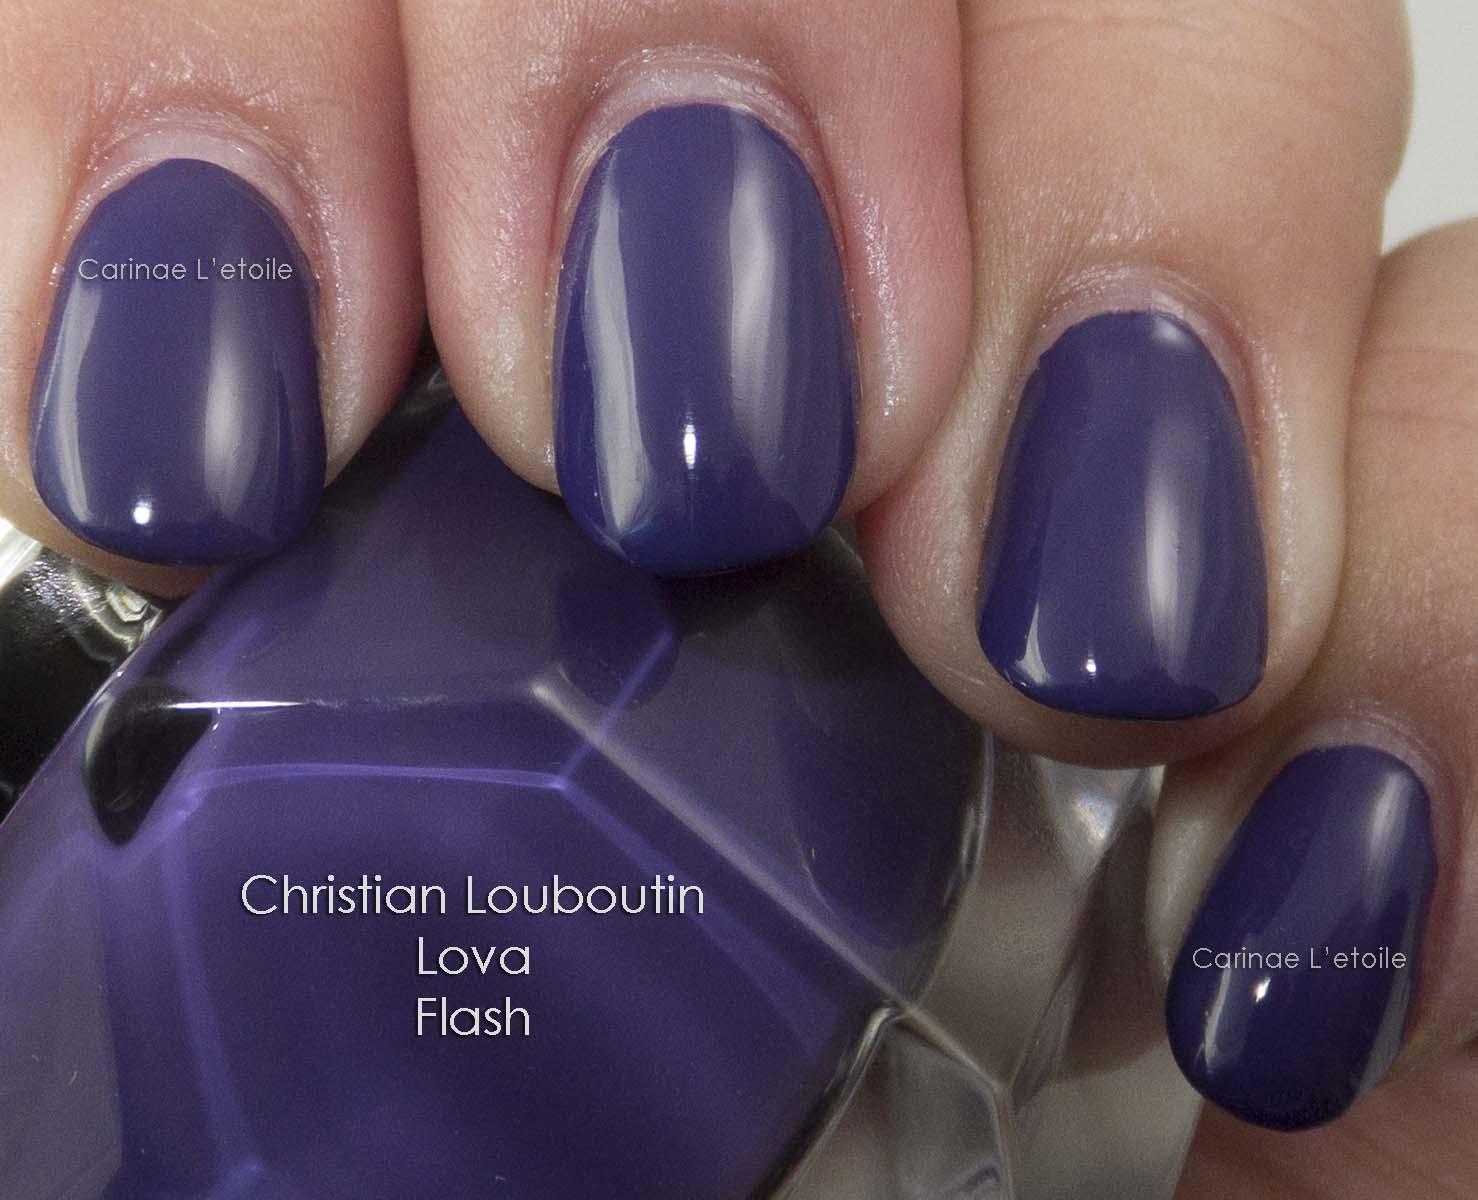 Christian Louboutin Lova